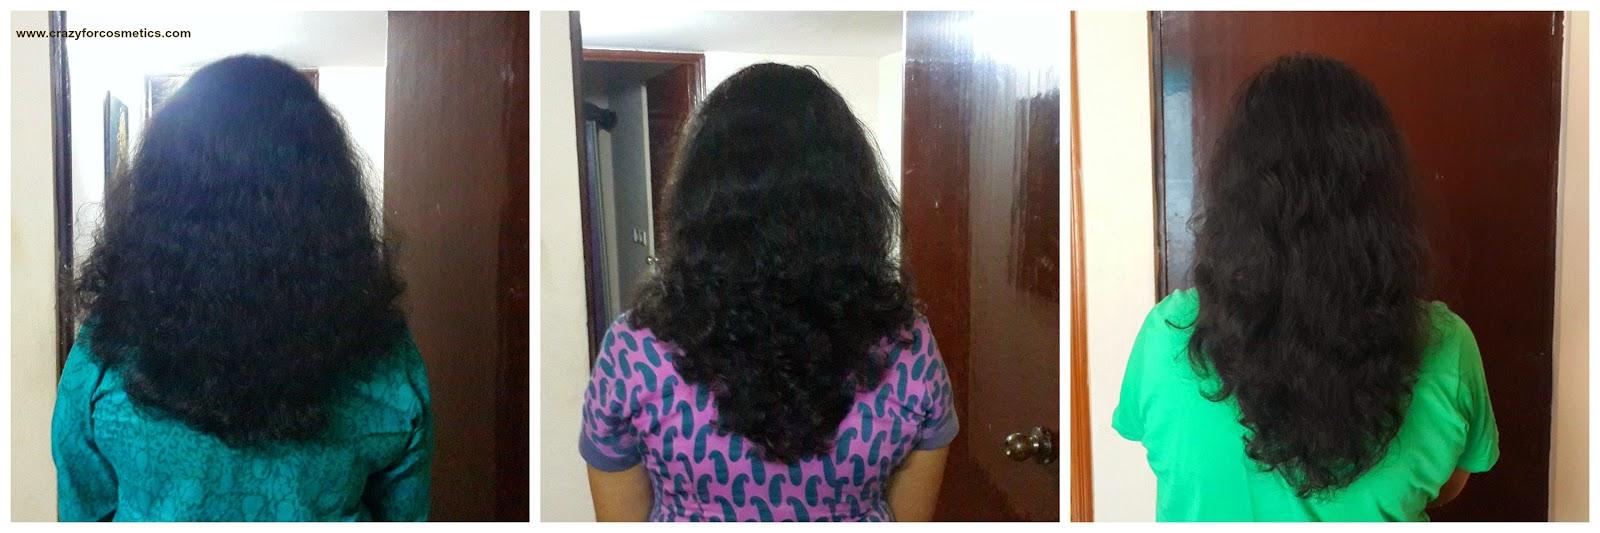 MABH hair oil benefits